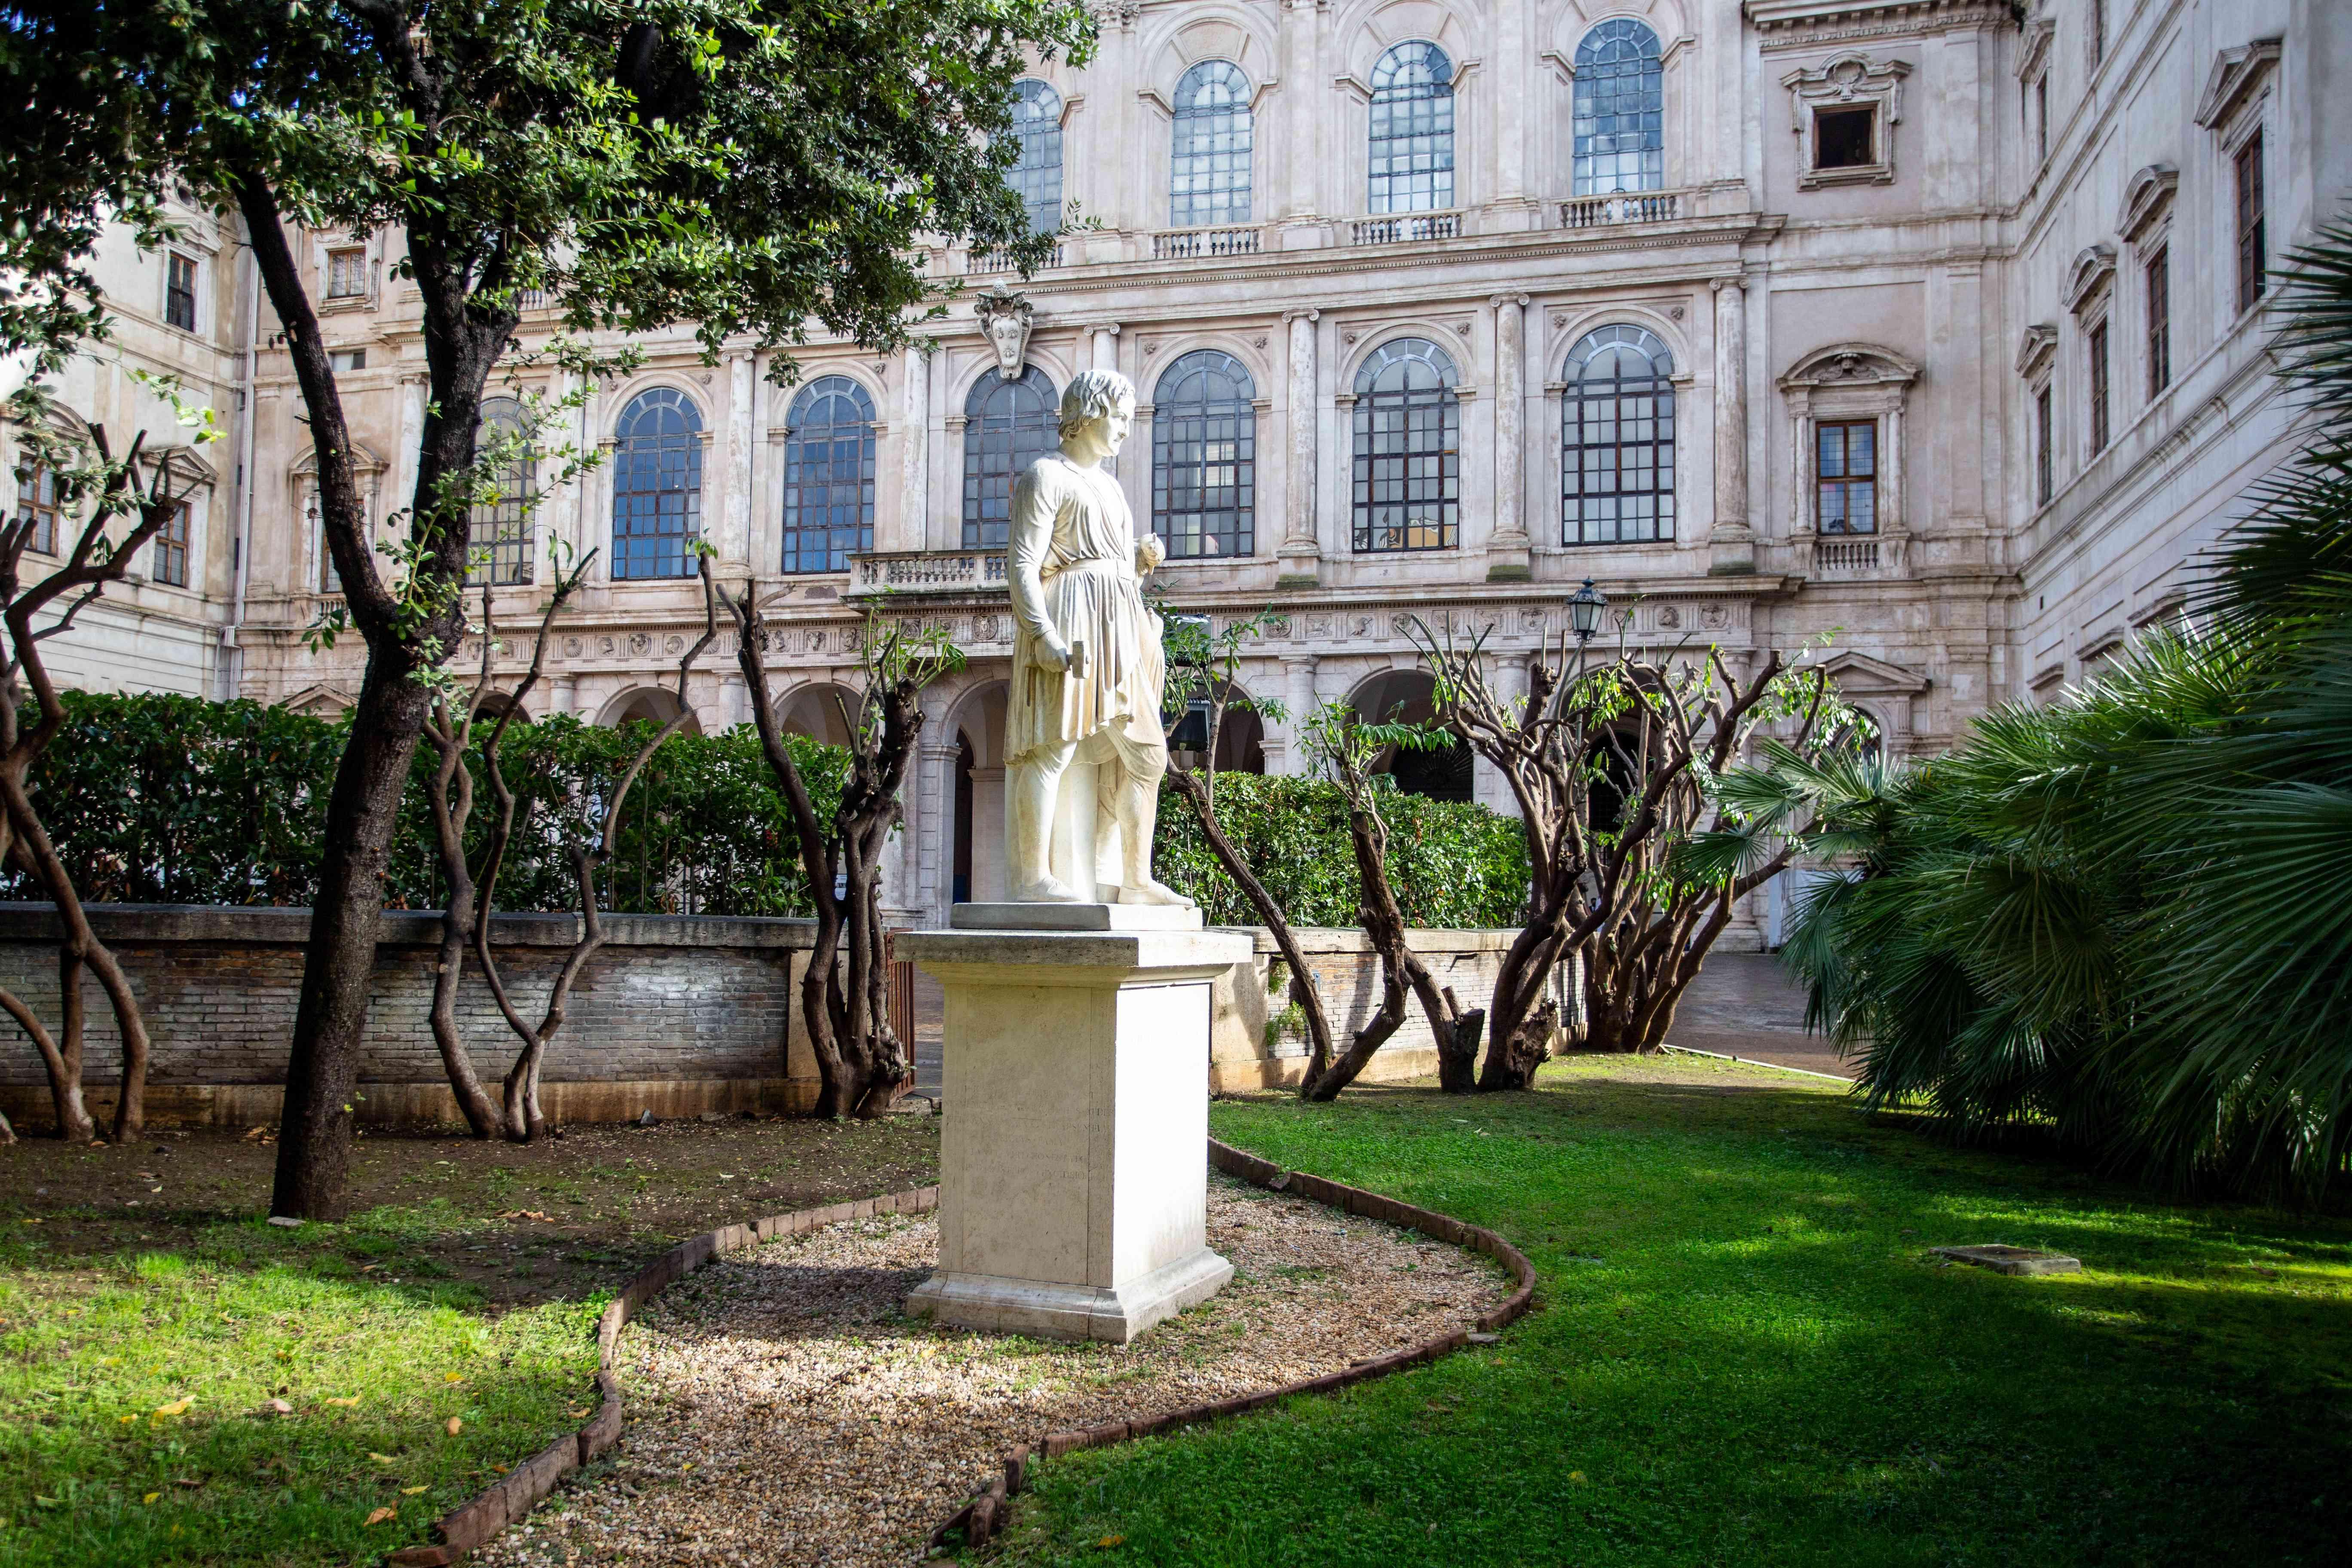 National Gallery of Ancient Art (Palazzo Barberini), Rome, Italy